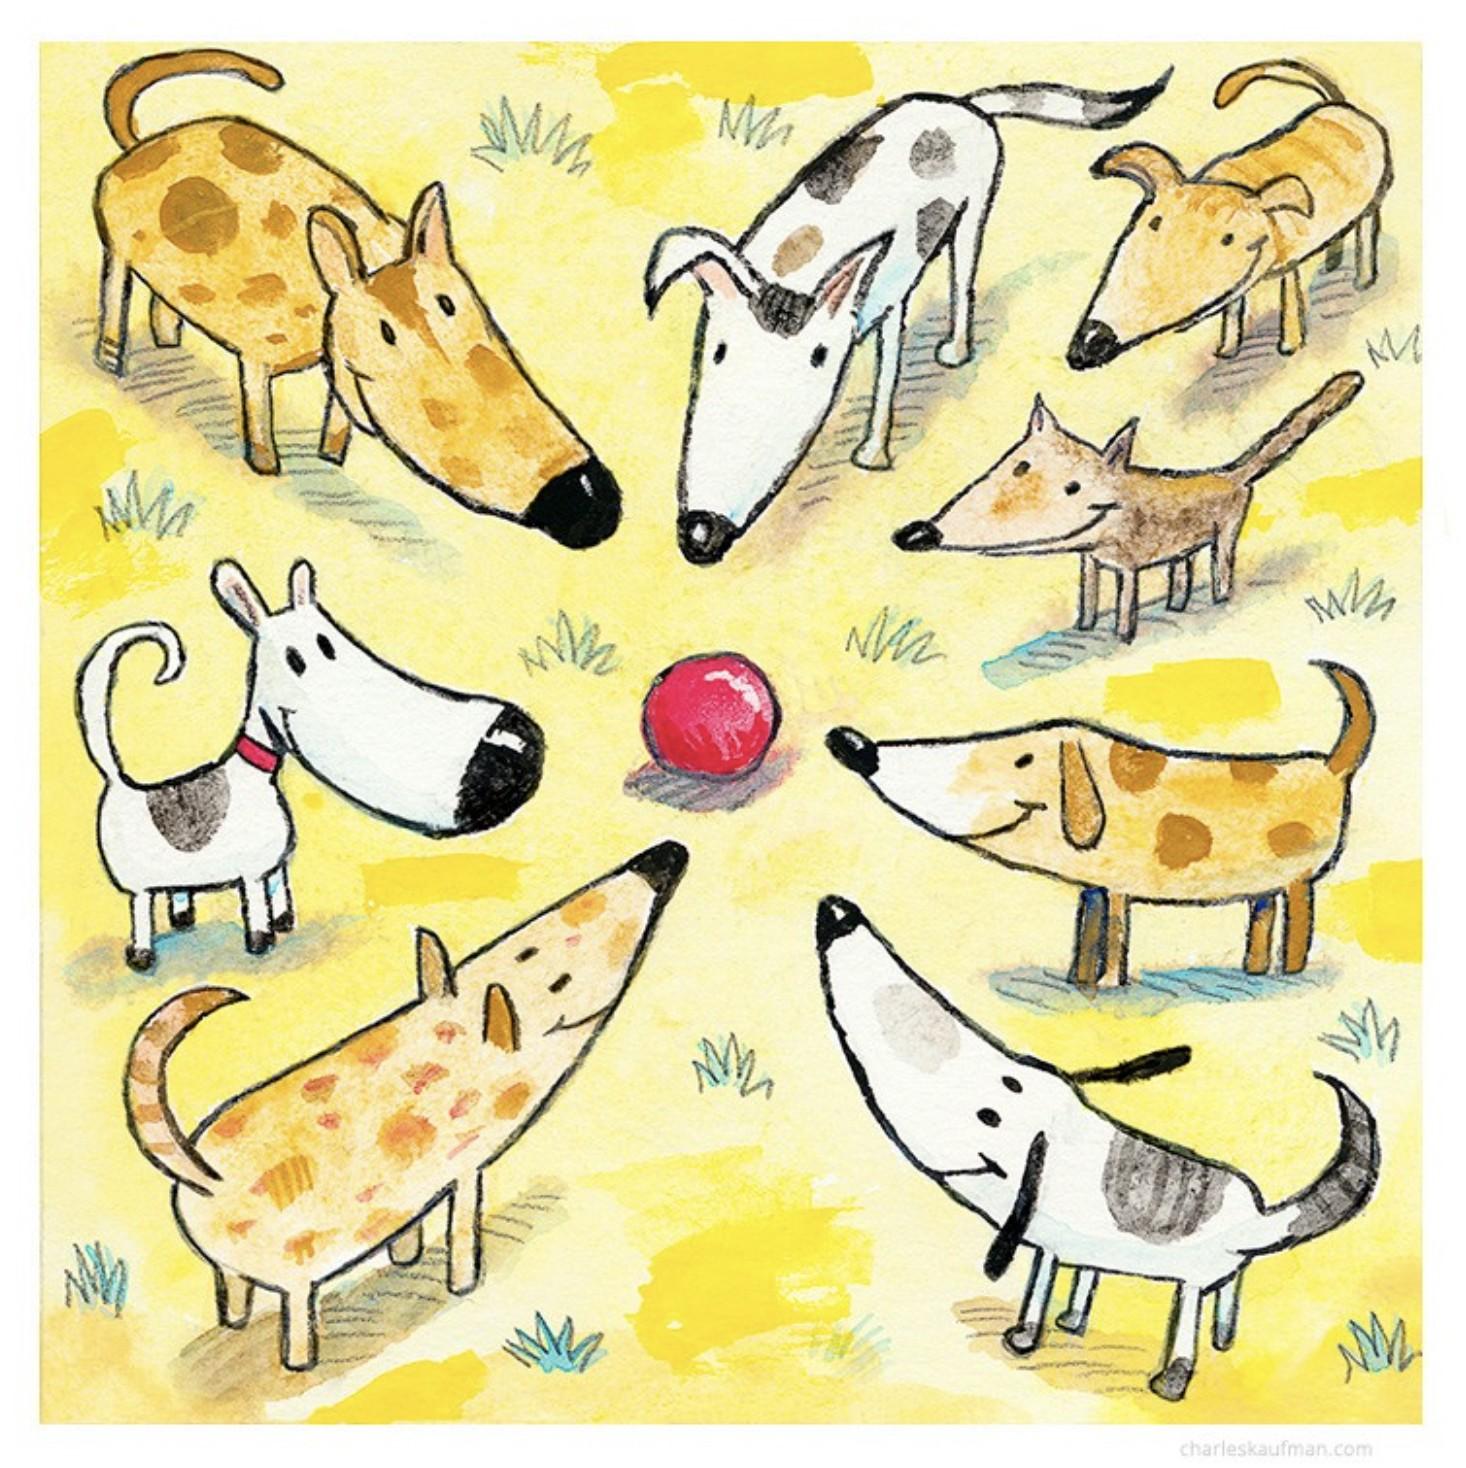 eight dogs one ball - Kaufmann, Charles - k-CHK394